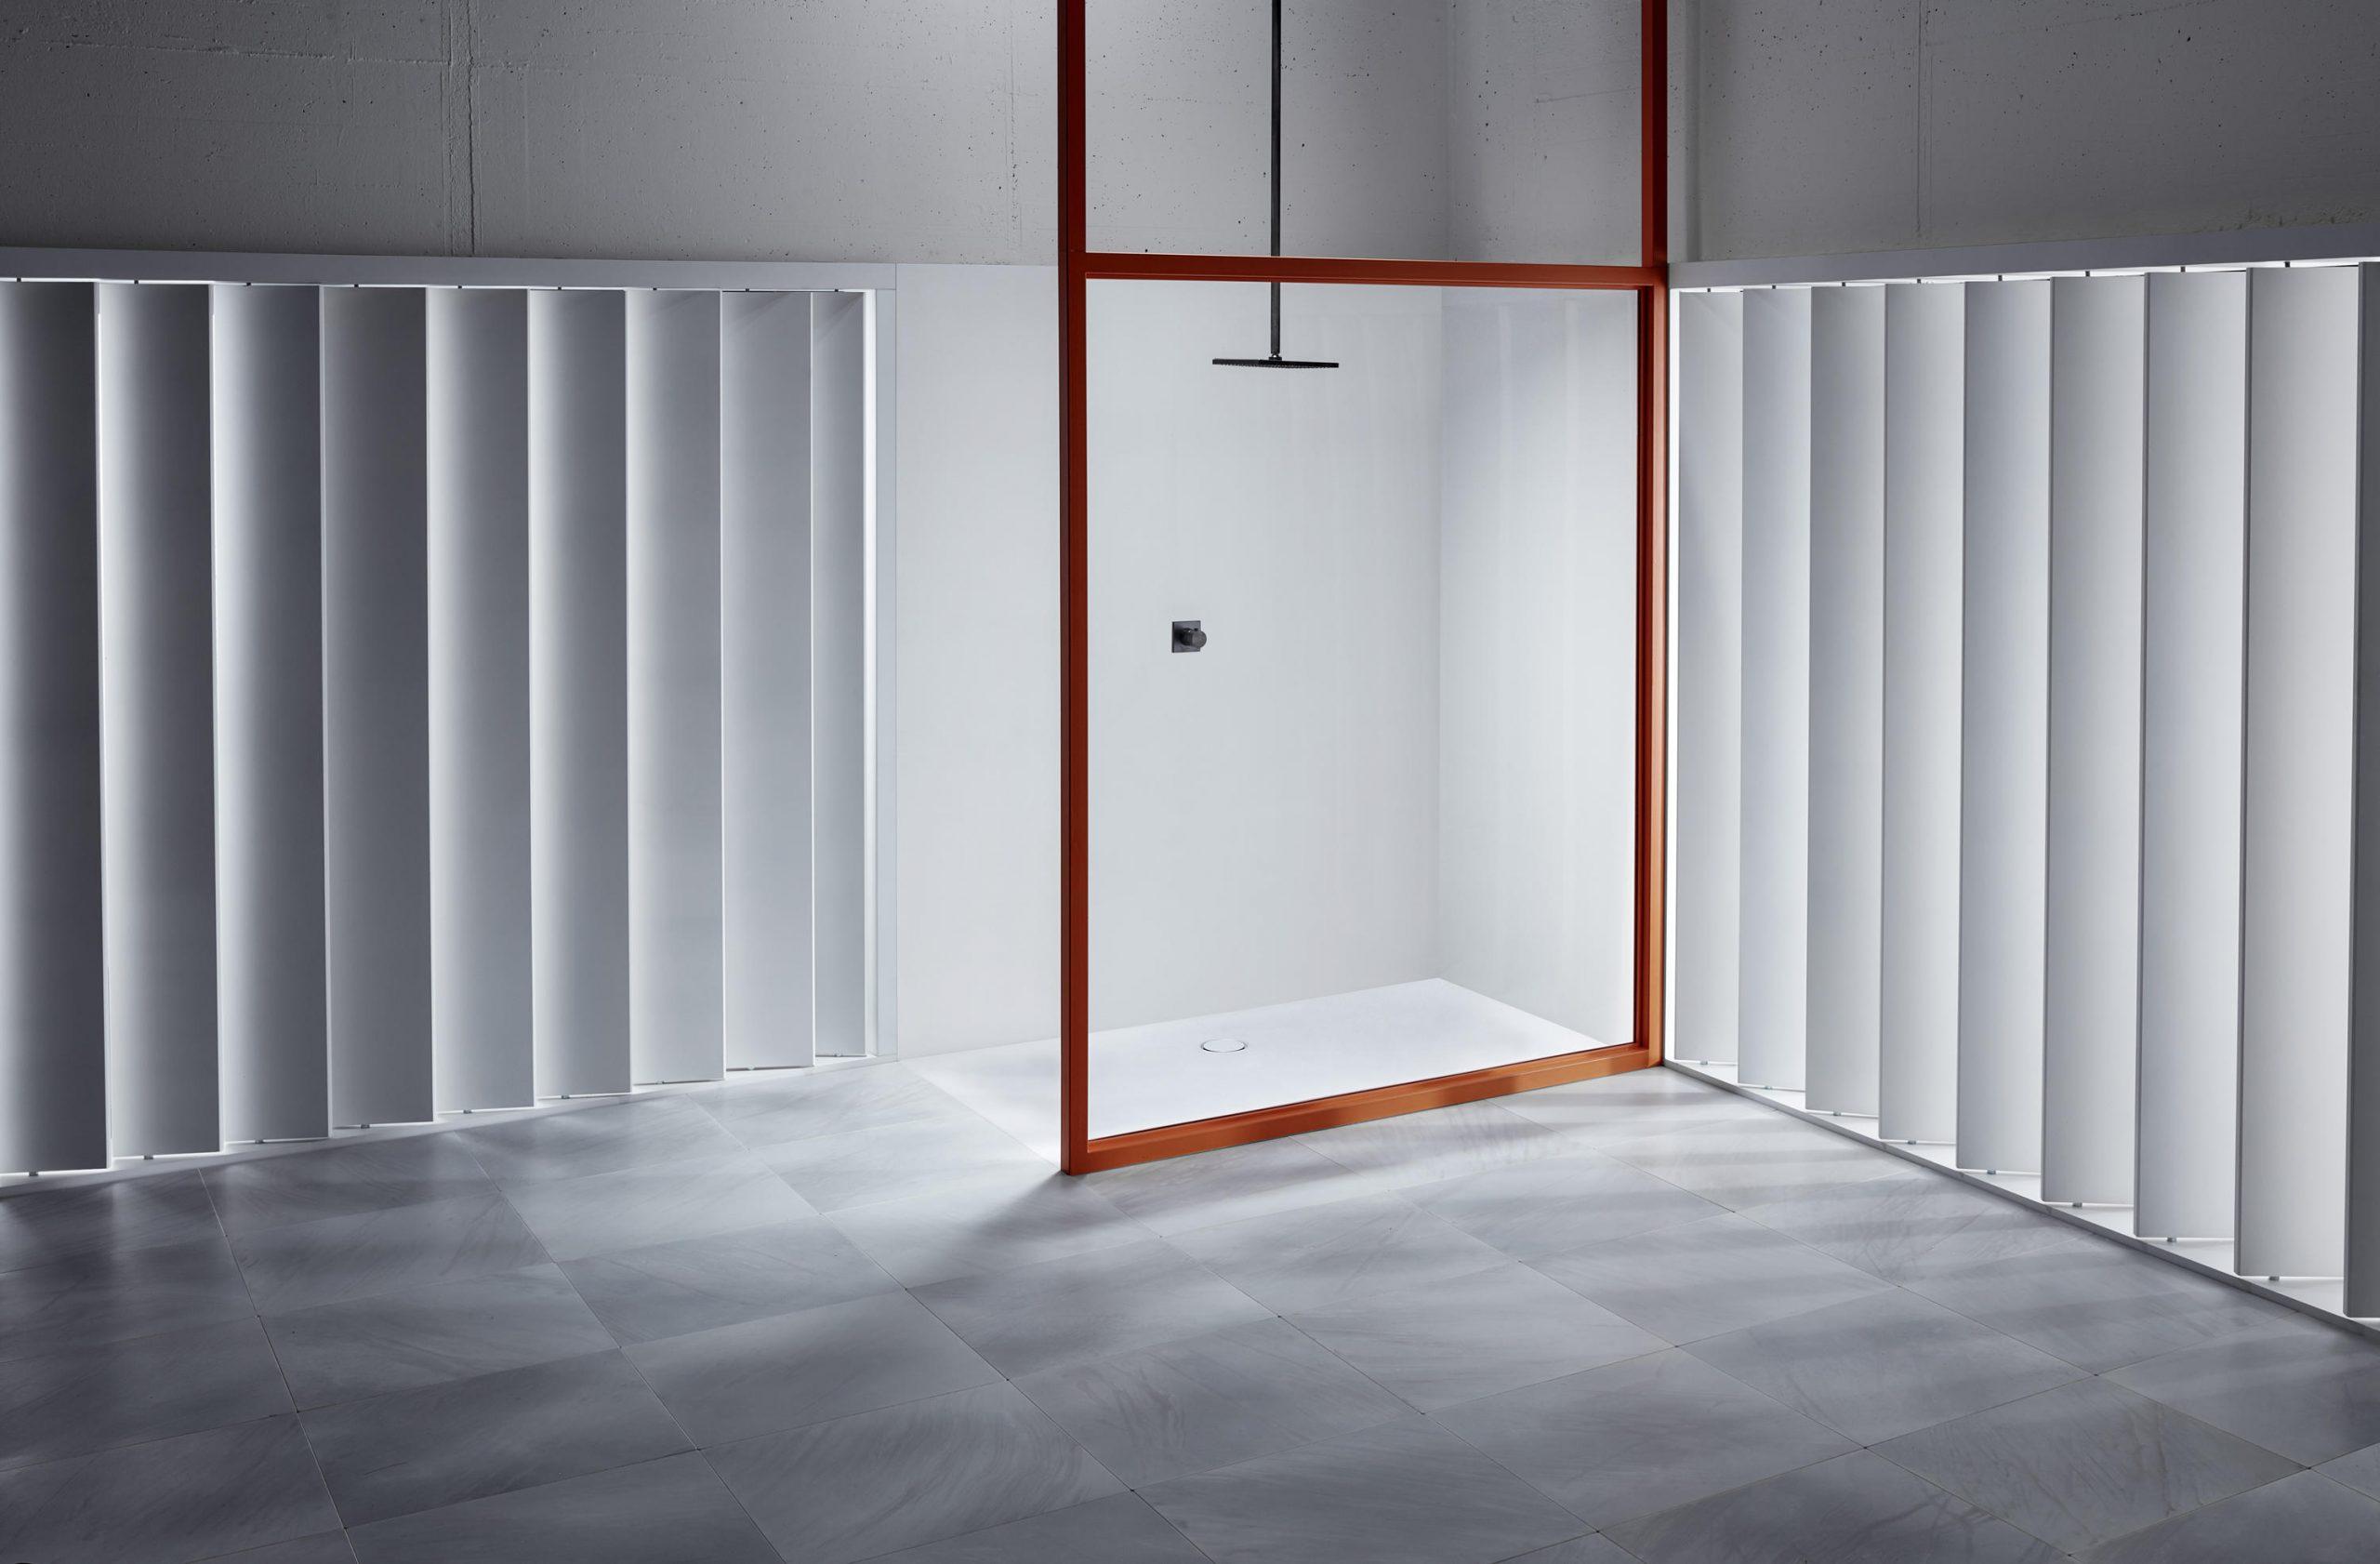 Full Size of Bette Floor Douchebak Duschwanne Abfluss Reinigen Side Installation Video Shower Waste Tray Brausetasse Bettefloor Ablauf Reinigung Moebel De Betten Günstige Bett Bette Floor